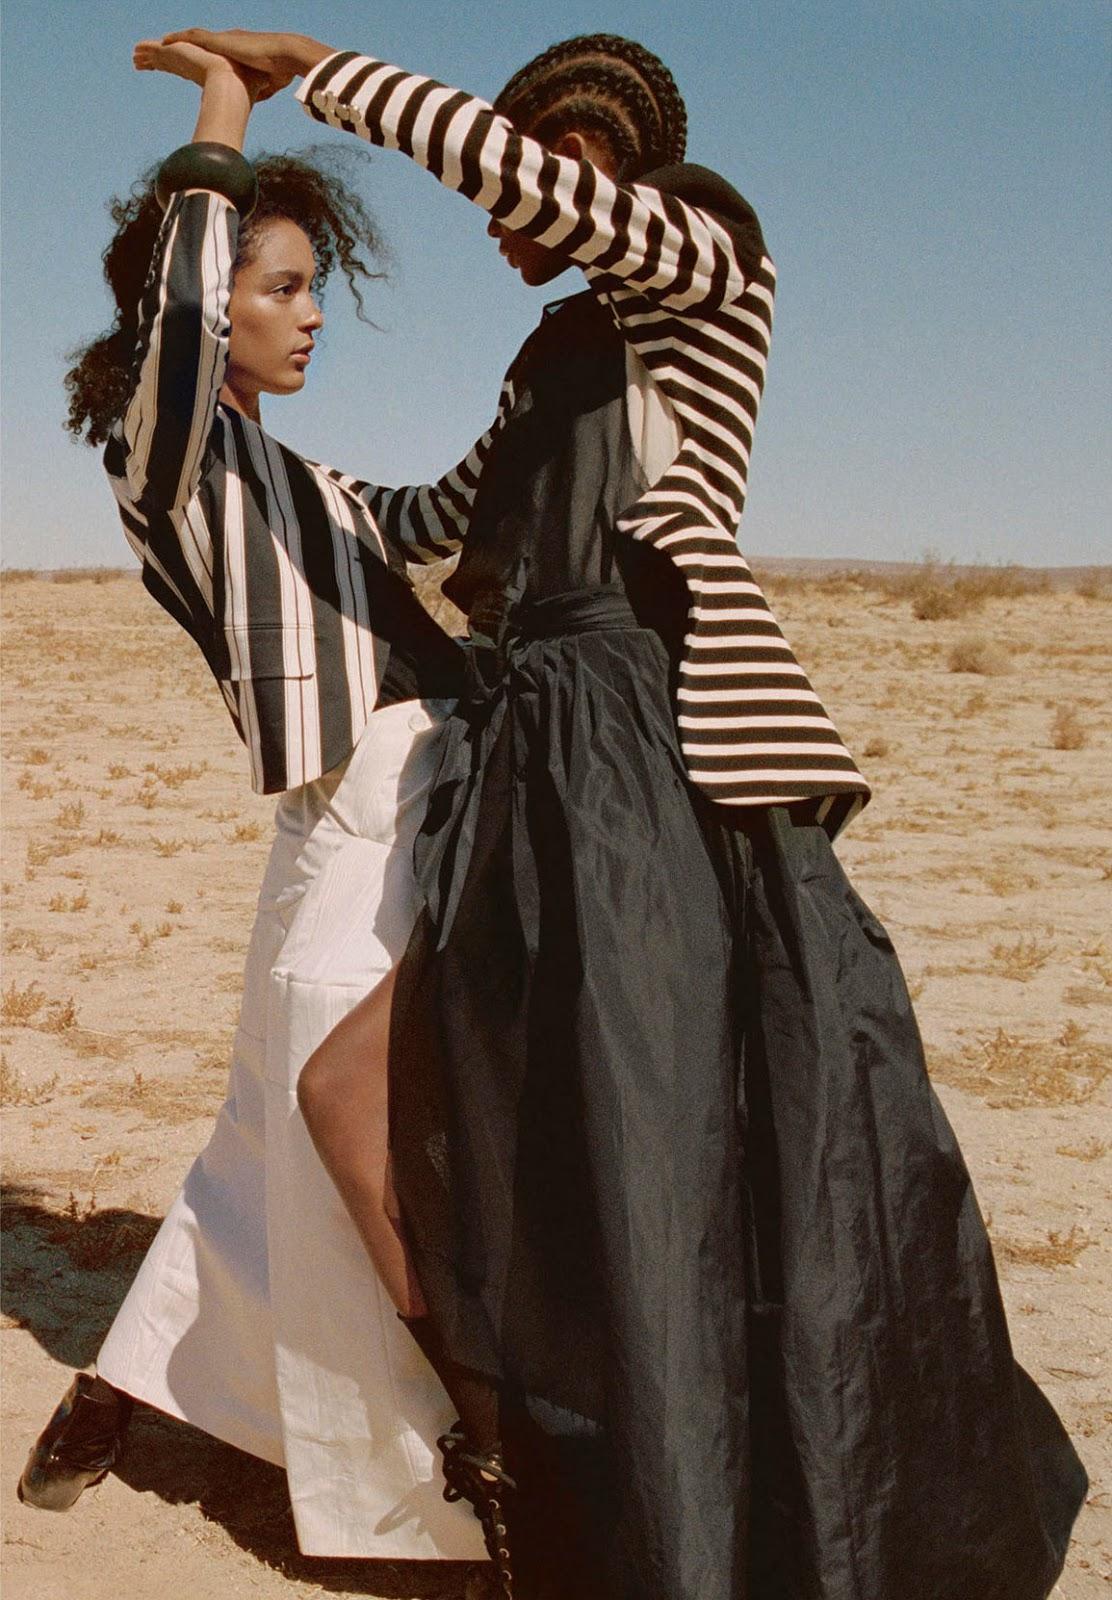 Elibeidy Martinez + Luisana Gonzalez by Yelena Yemchuk for Porter Edit Winter Escape 2018 (7).jpg